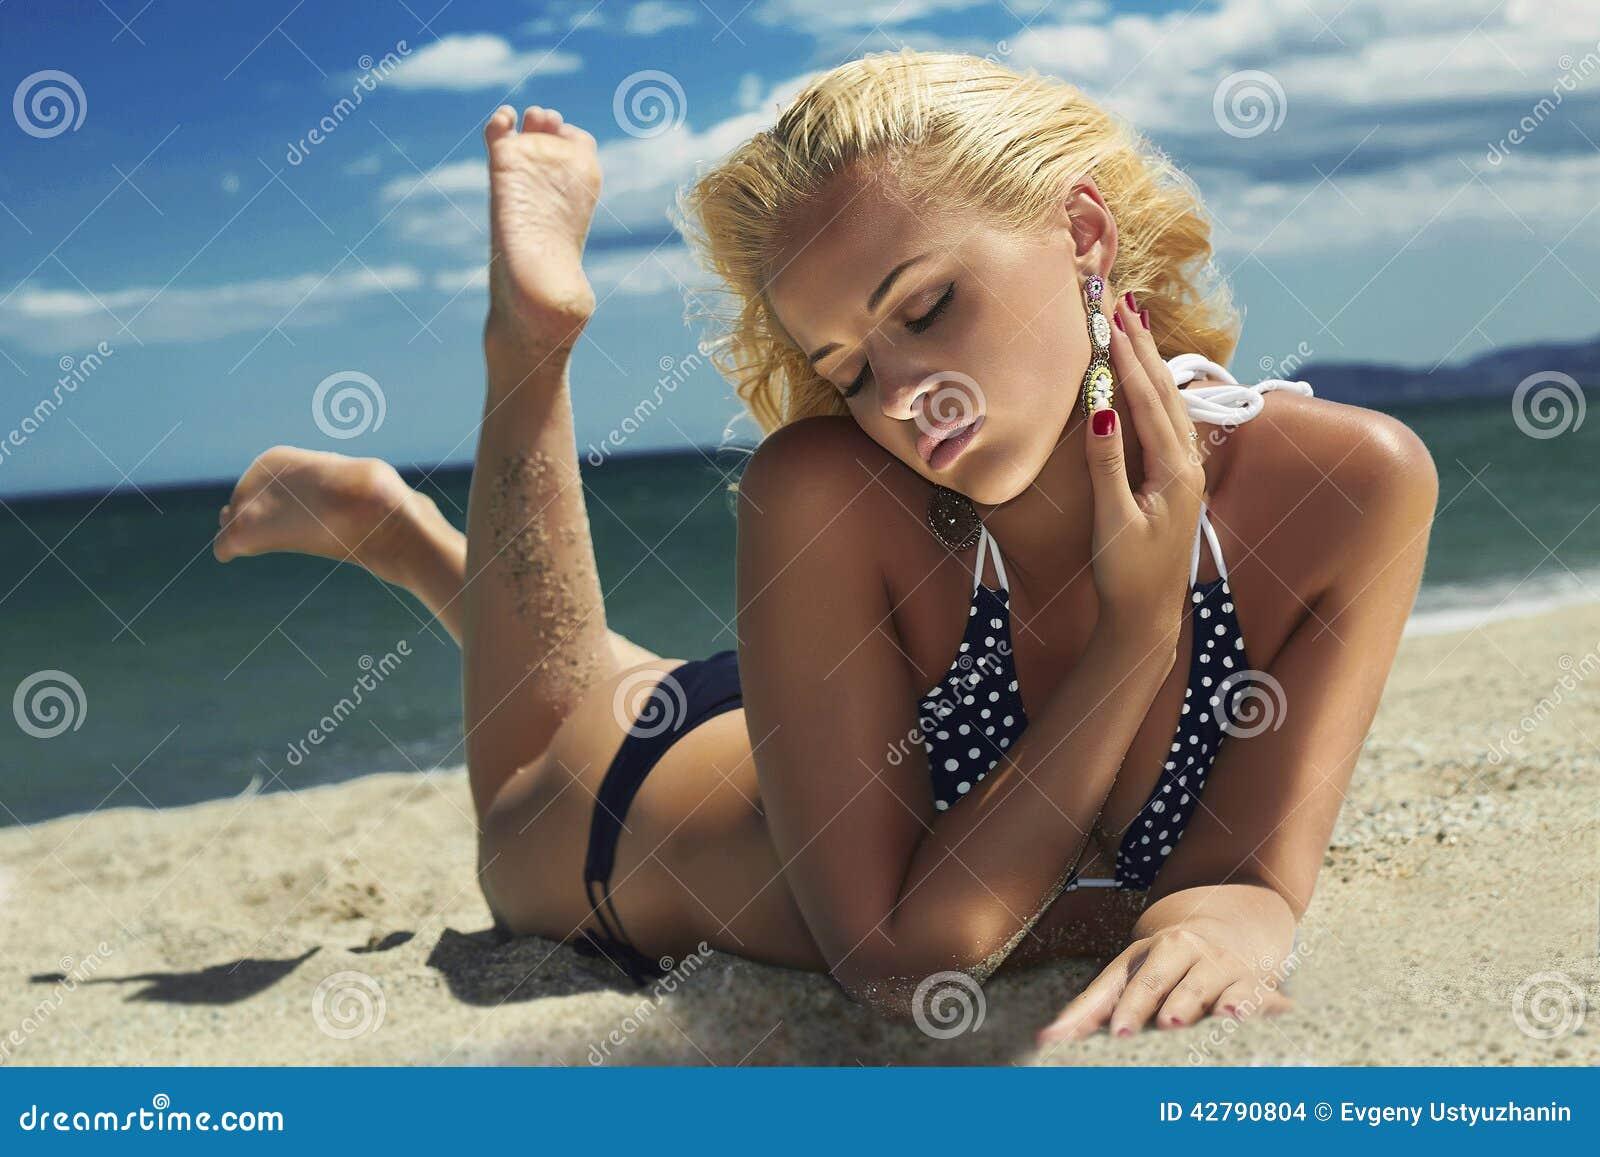 Beautiful woman on the beach. Blond girl in bikini. summer holidays